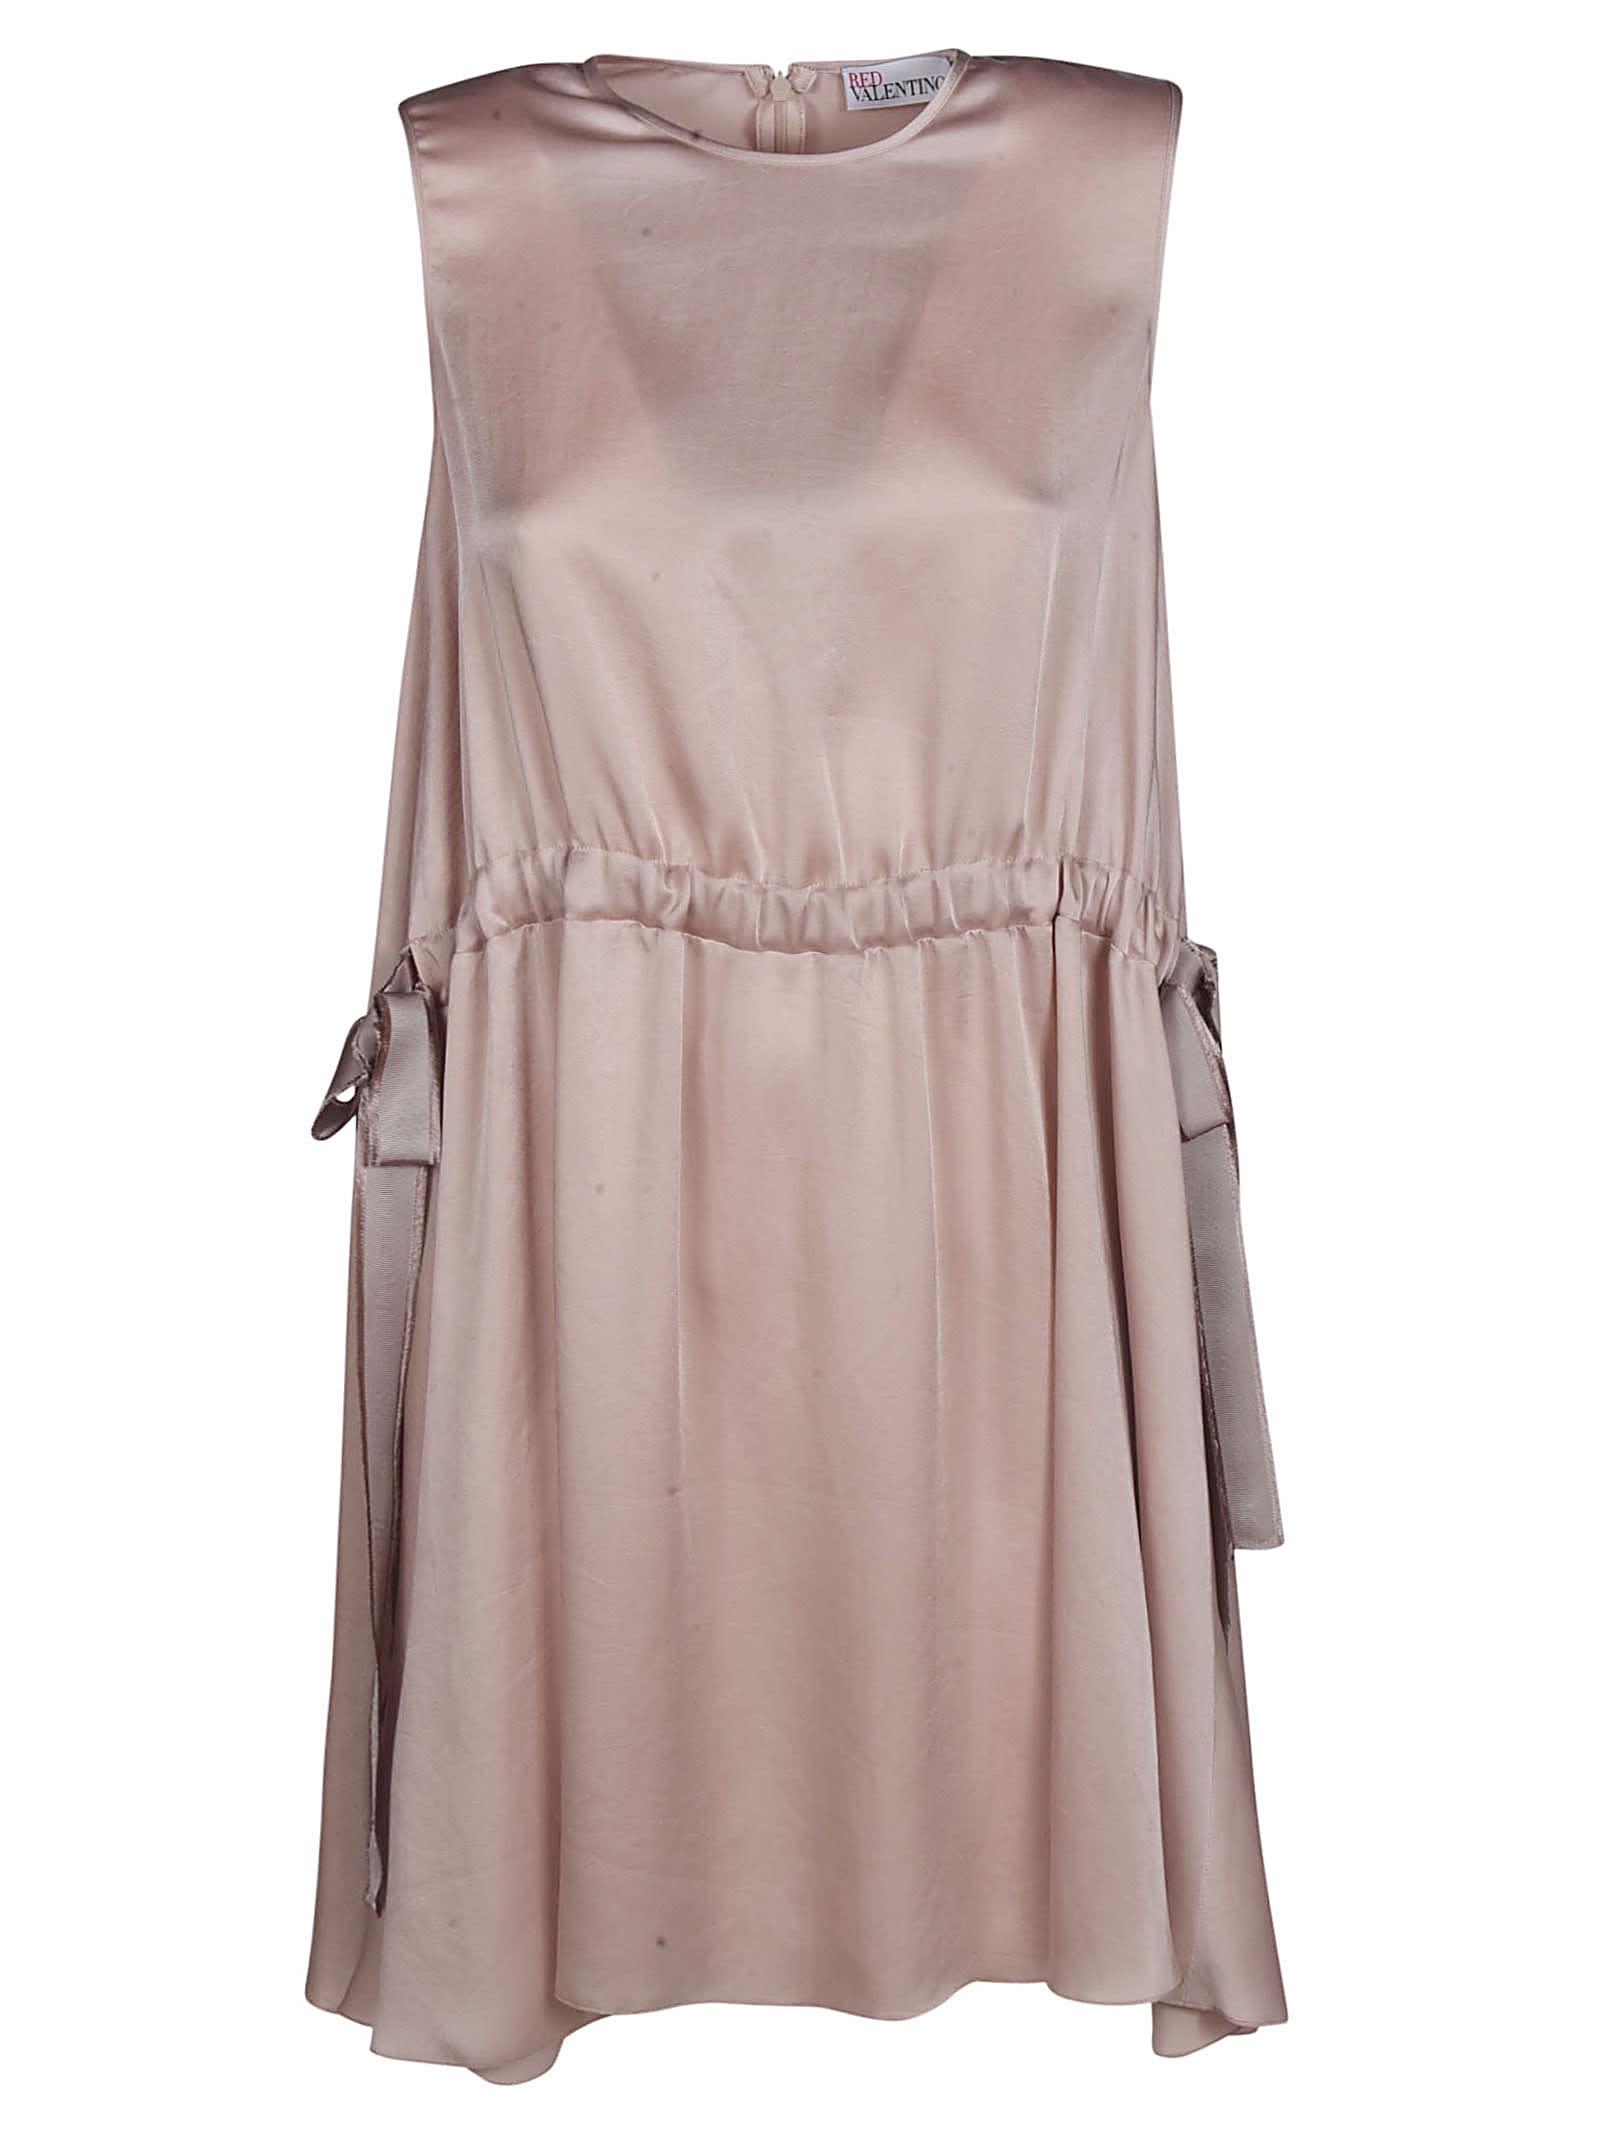 RED Valentino Fluid Satin Dress